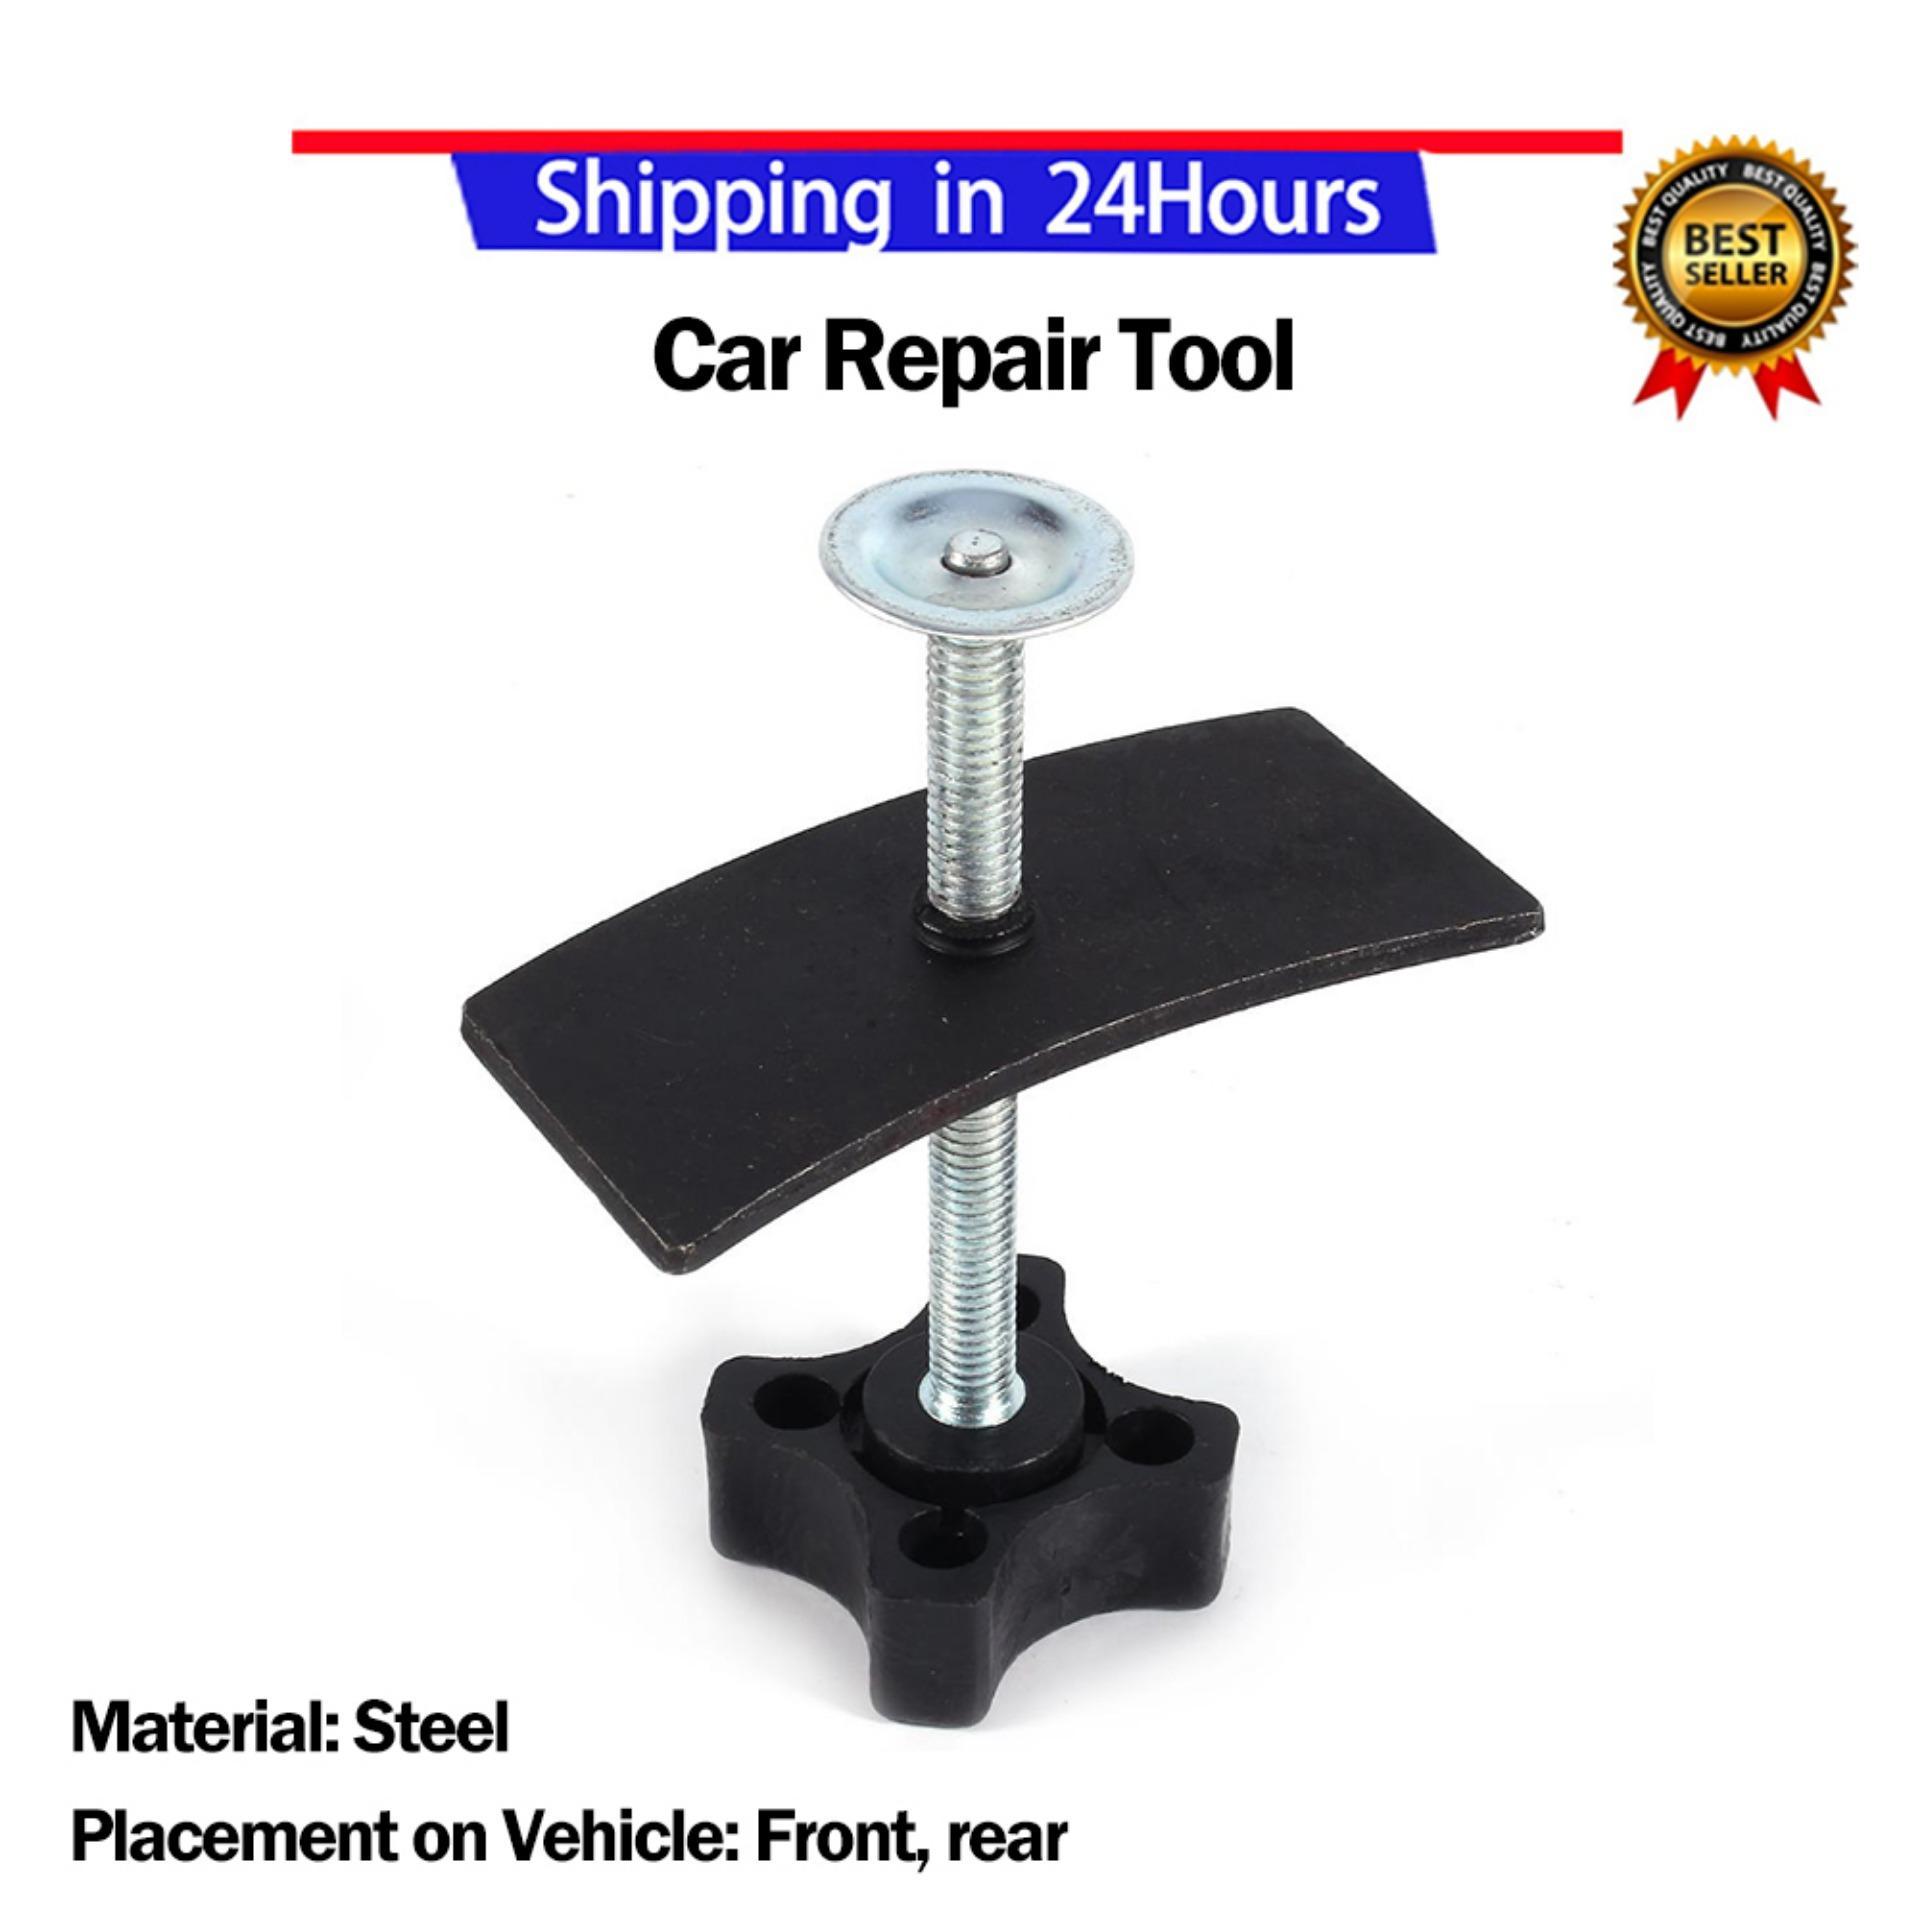 Vehicle Disc Brake Pad Spreader Install Caliper Piston Compressor Car Repair Tool